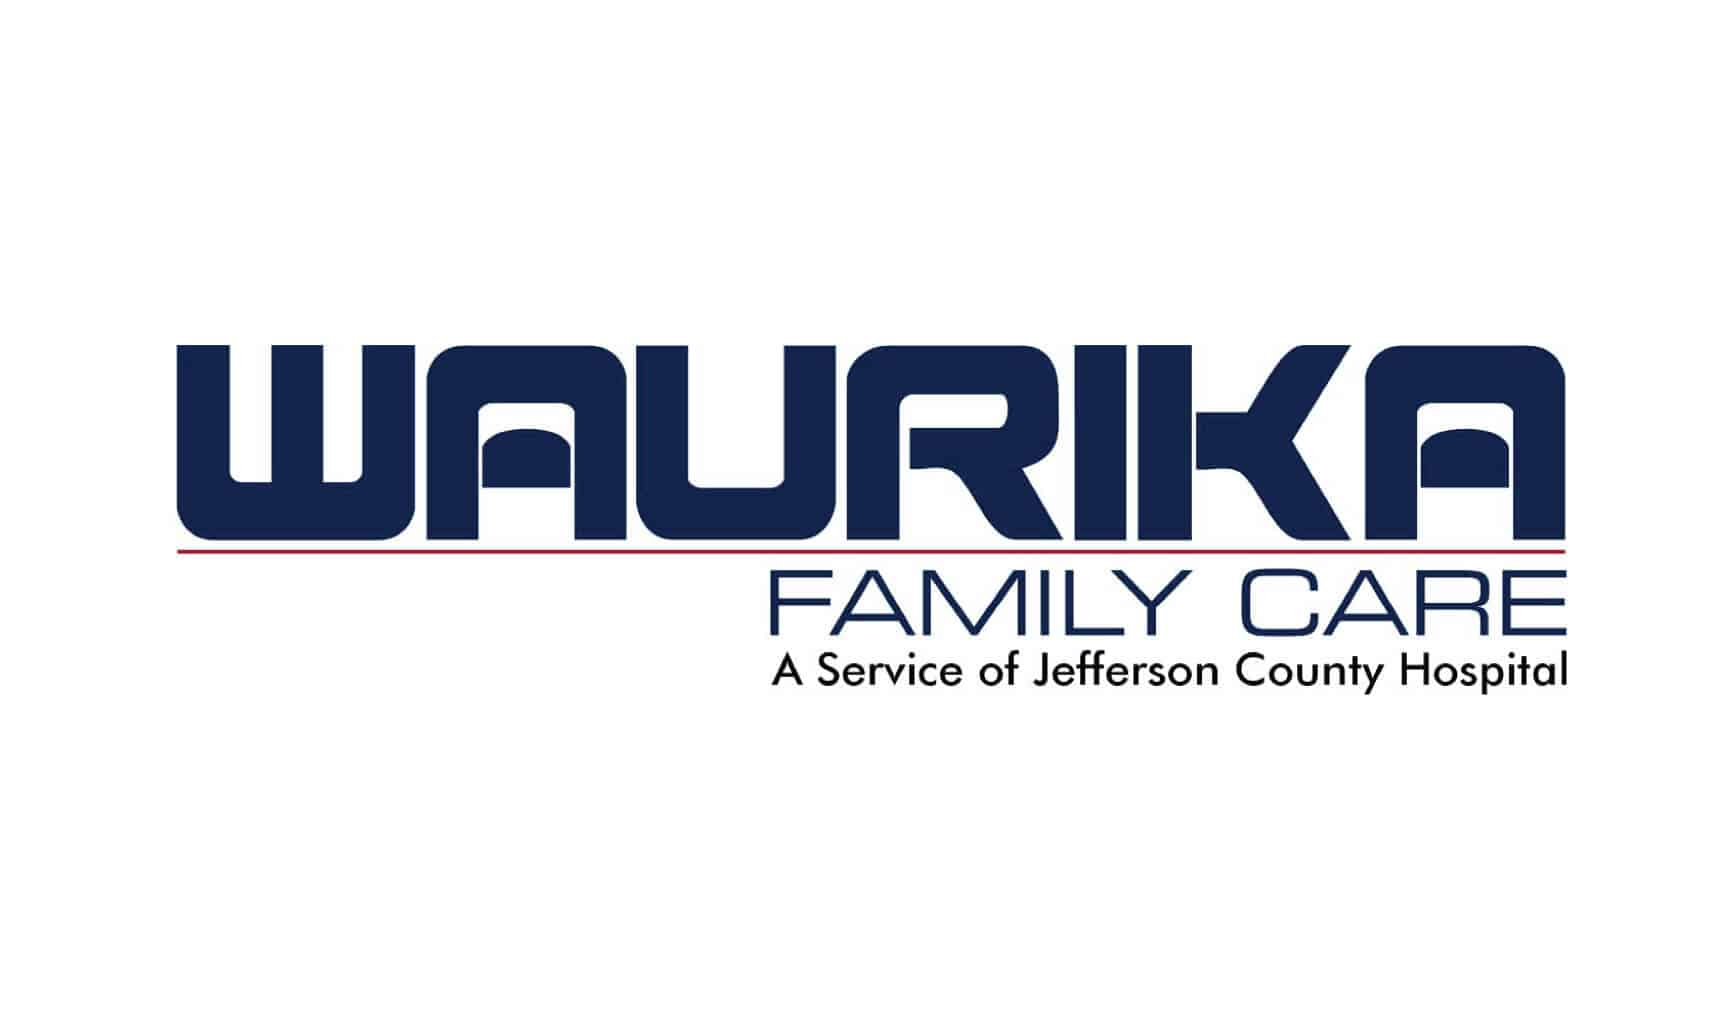 Logo of Waurika Family Care